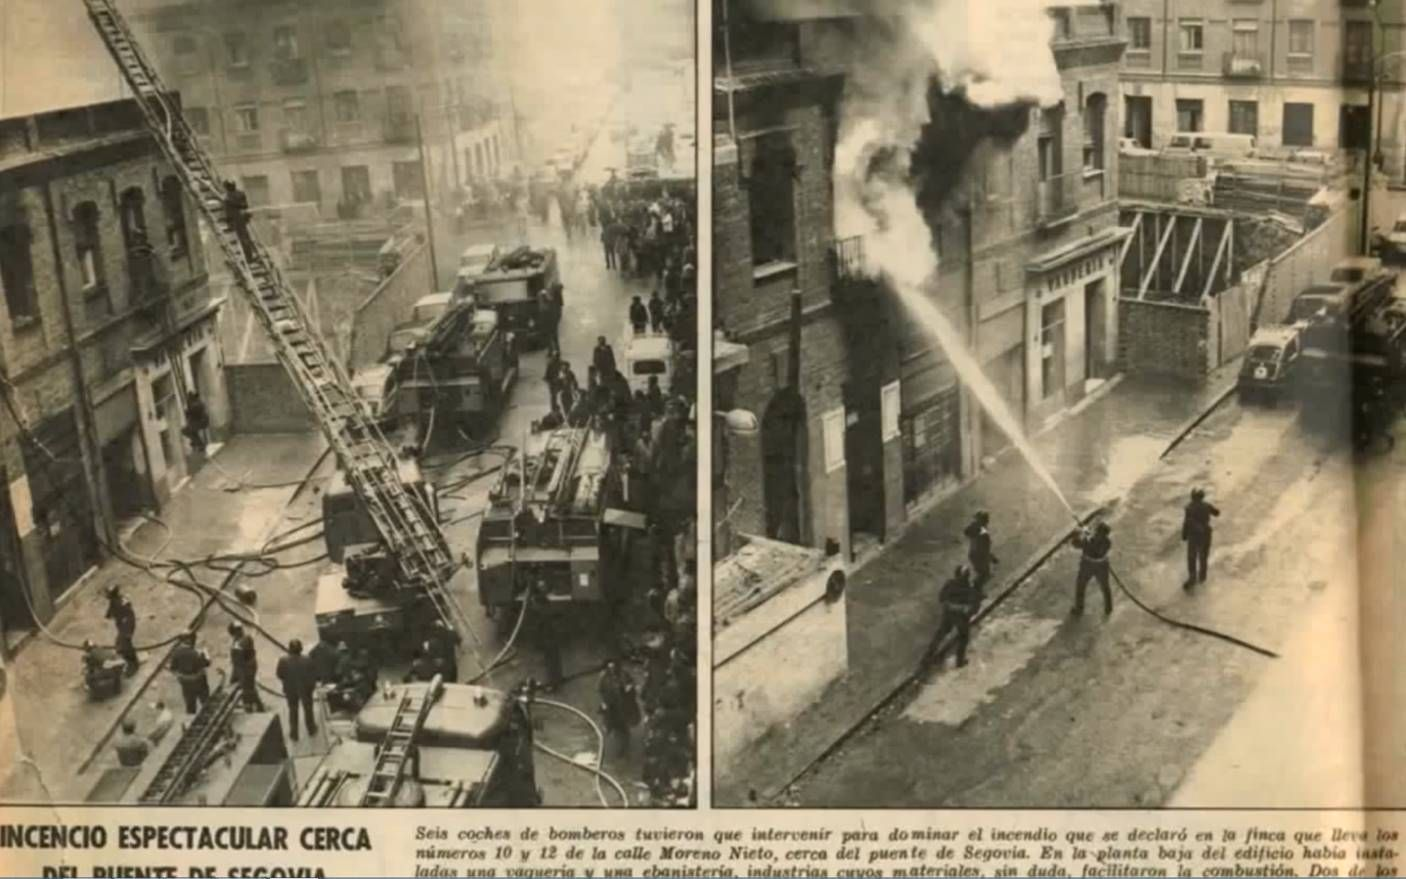 Incendio en la calle Moreno Nieto 10-12. Madrid